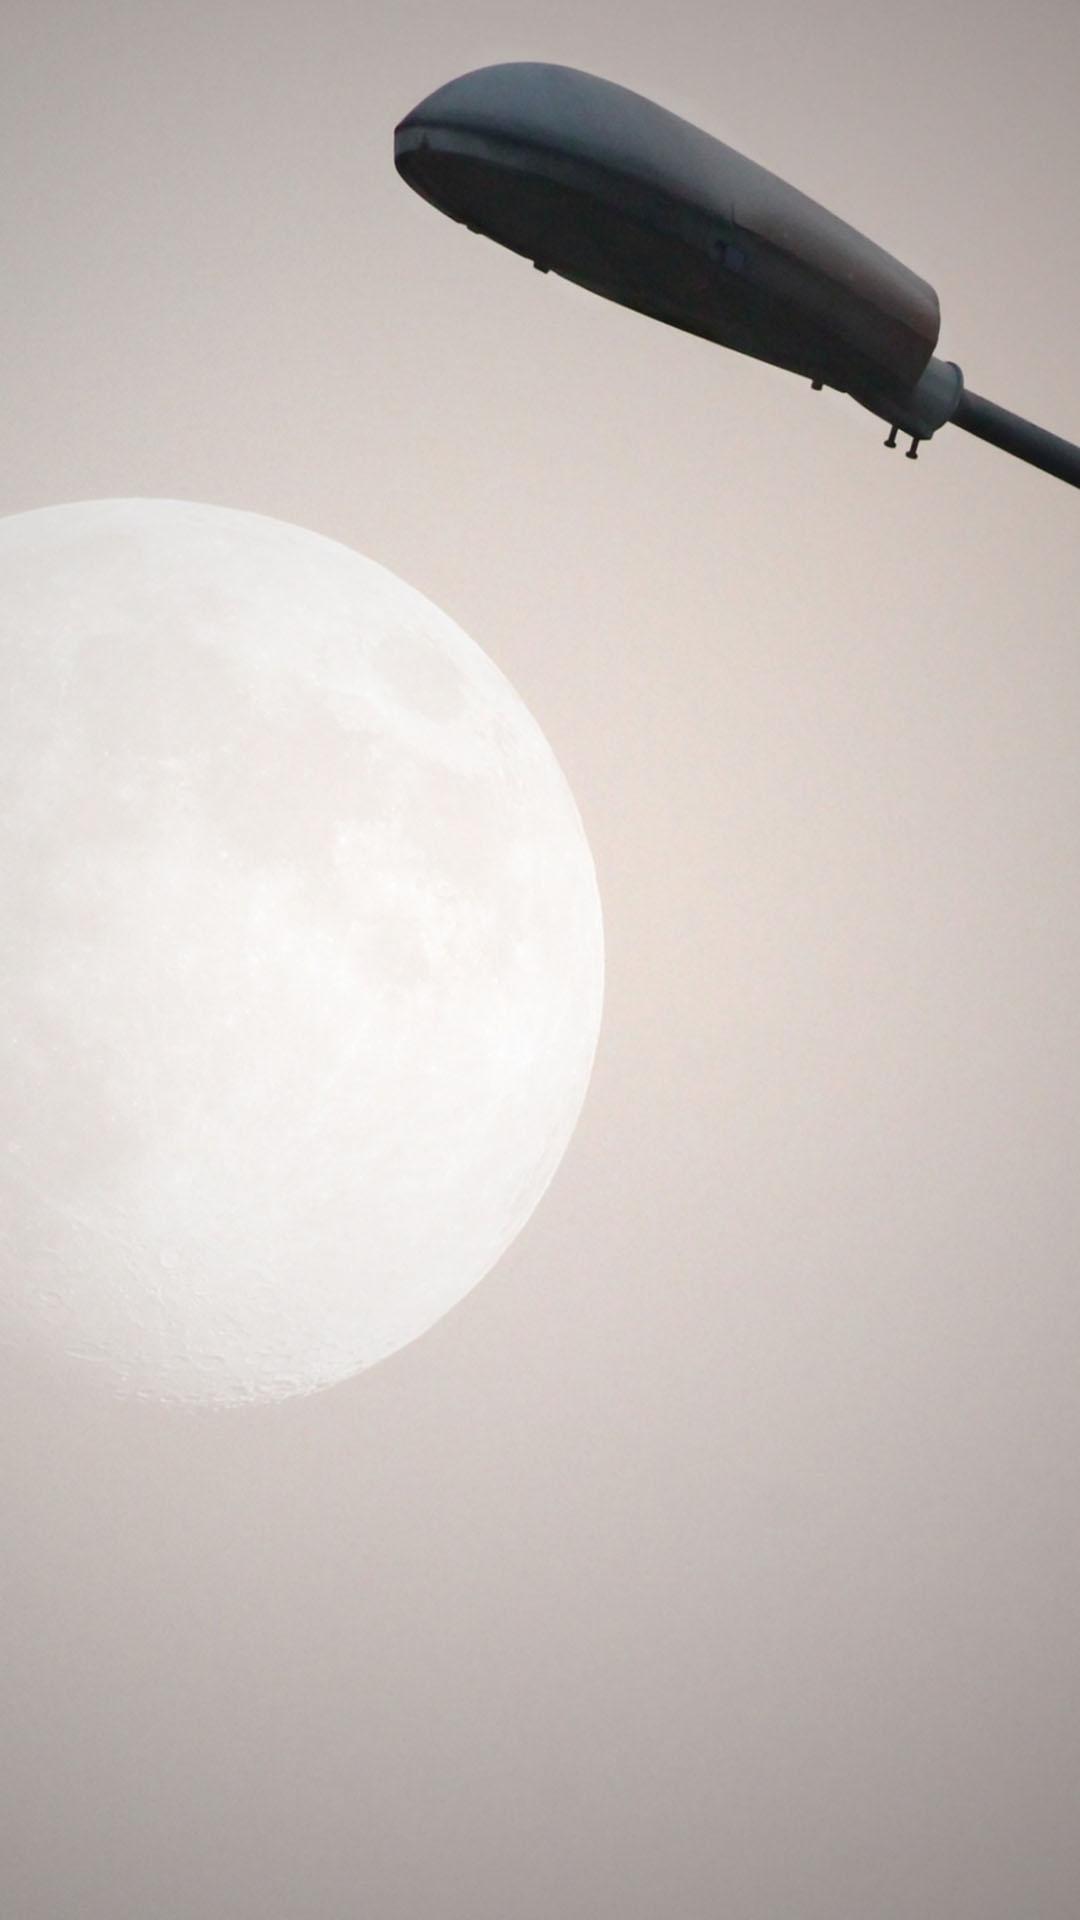 Street Light Moon iPhone 6 Plus HD Wallpaper